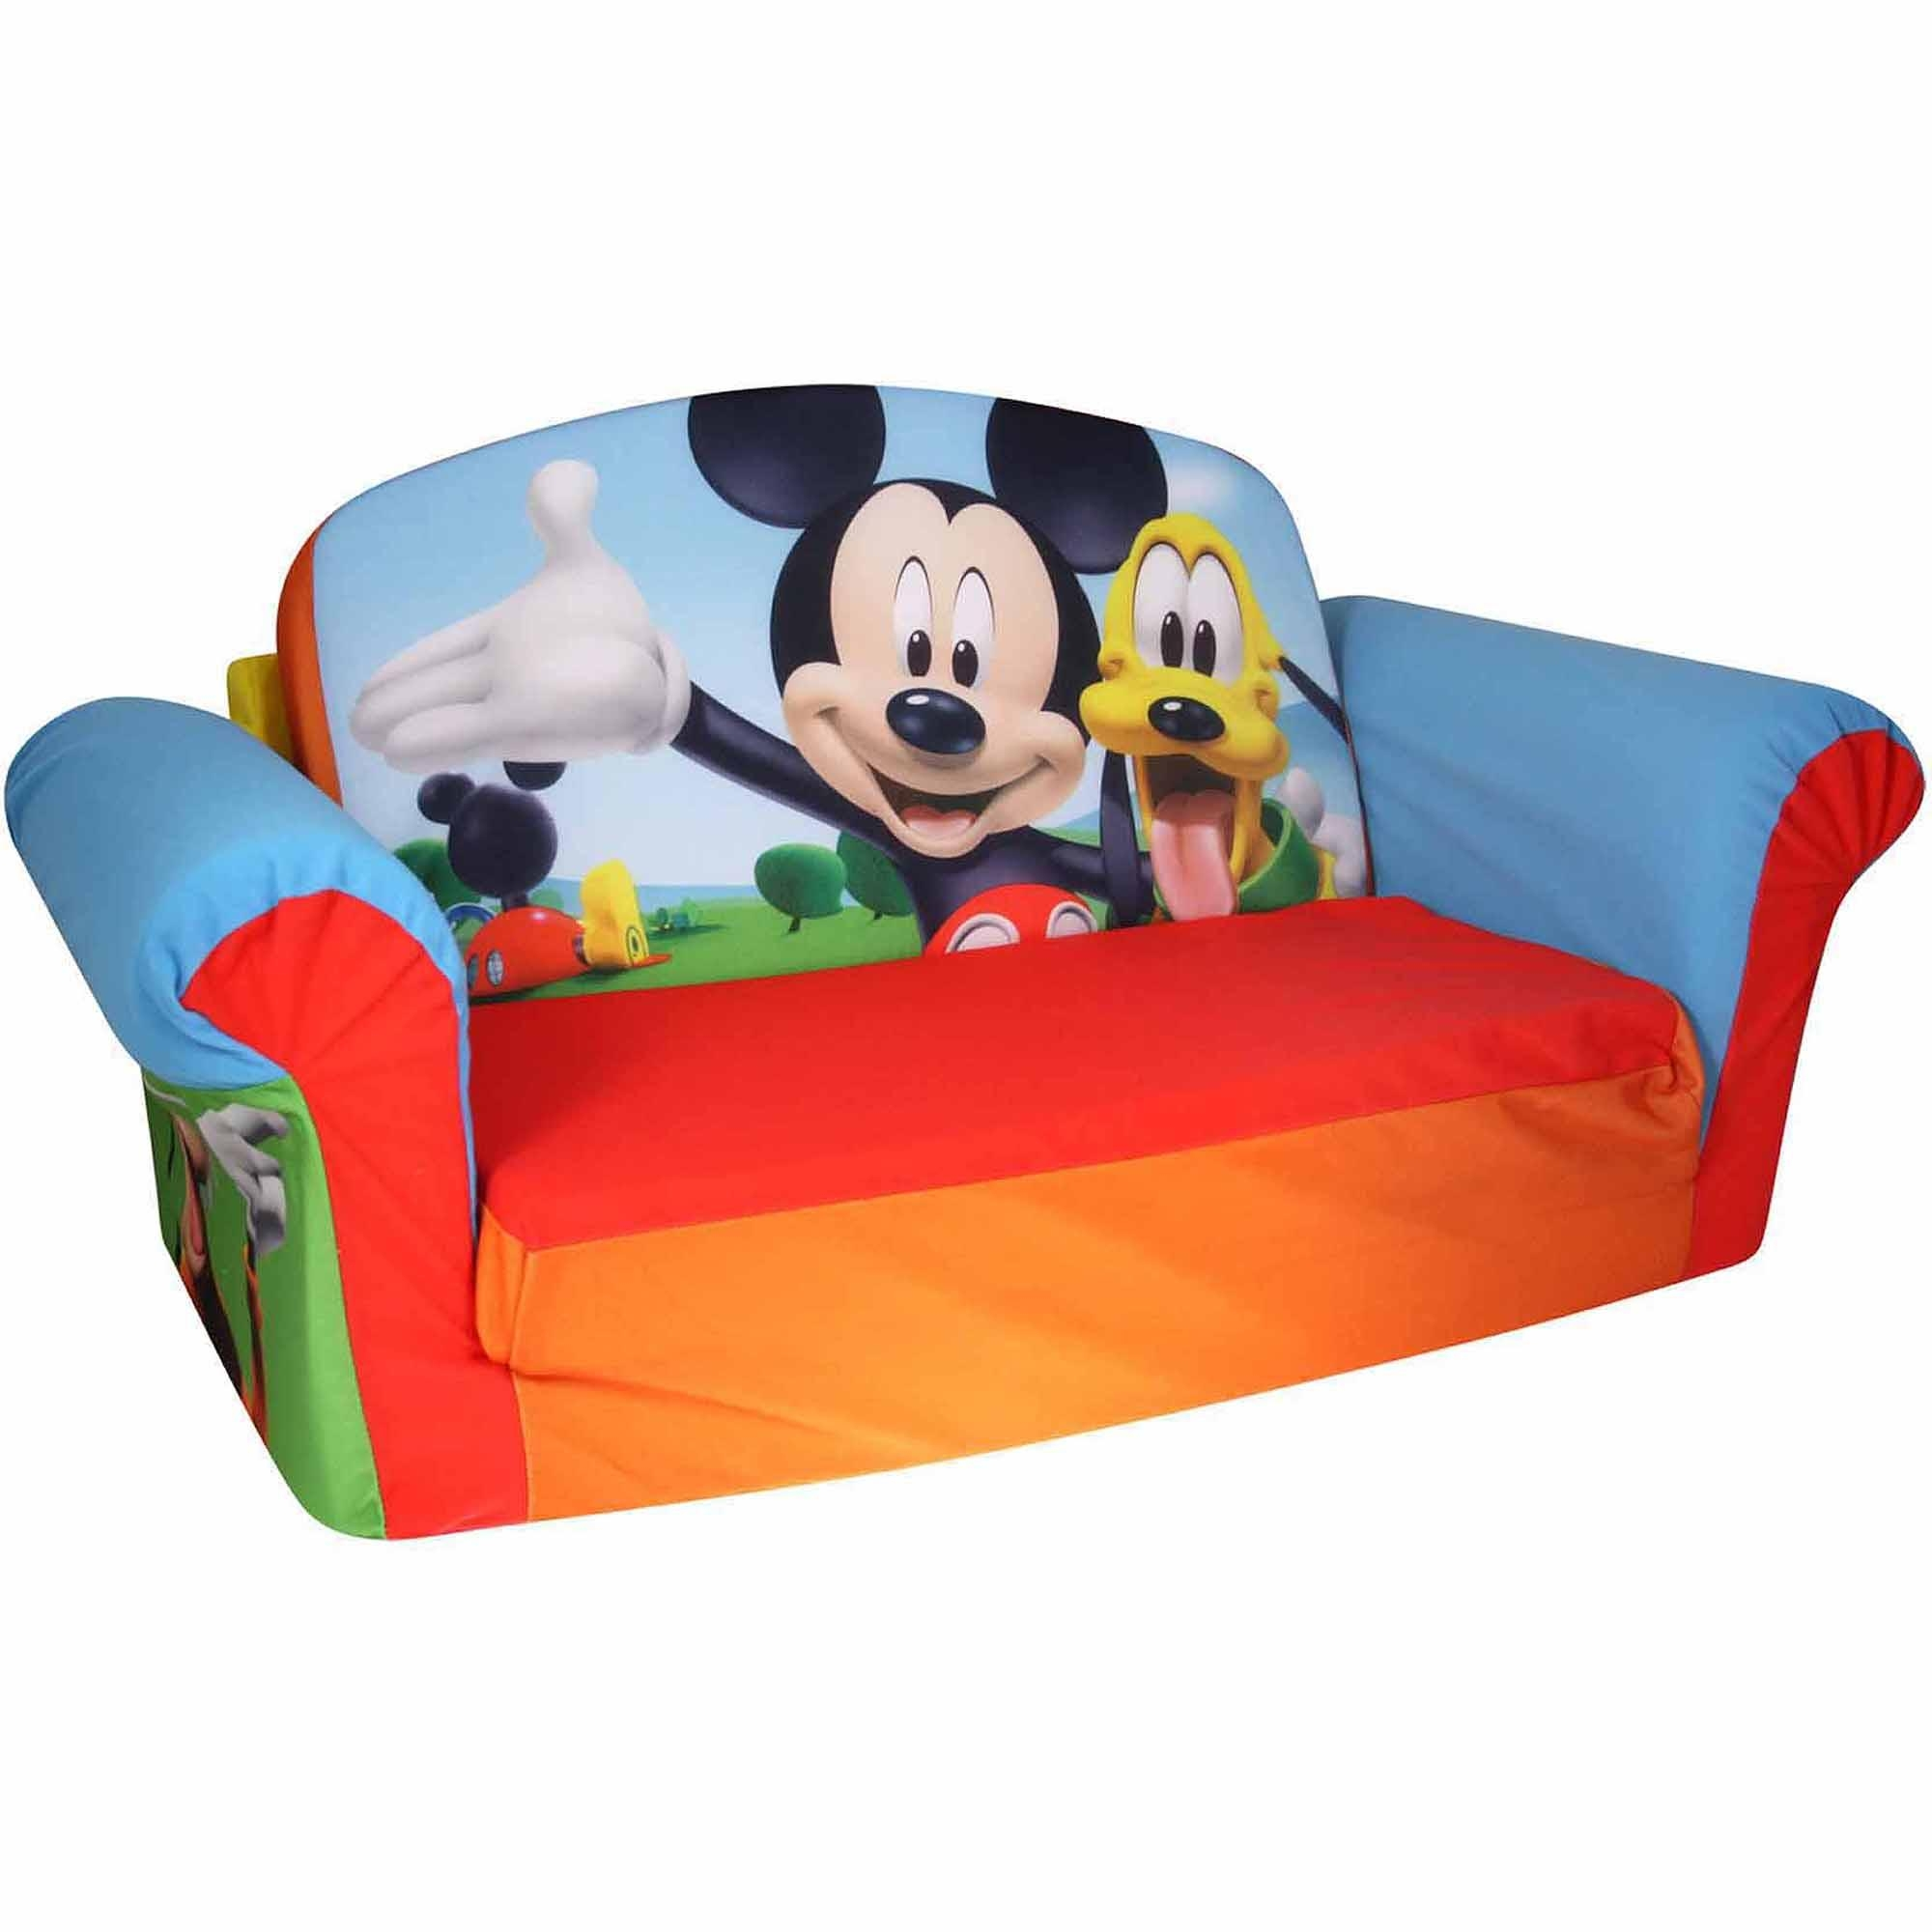 Sofas Center : Outstanding Flip Open Sofa Images Inspirations Regarding Princess Flip Open Sofas (View 11 of 20)